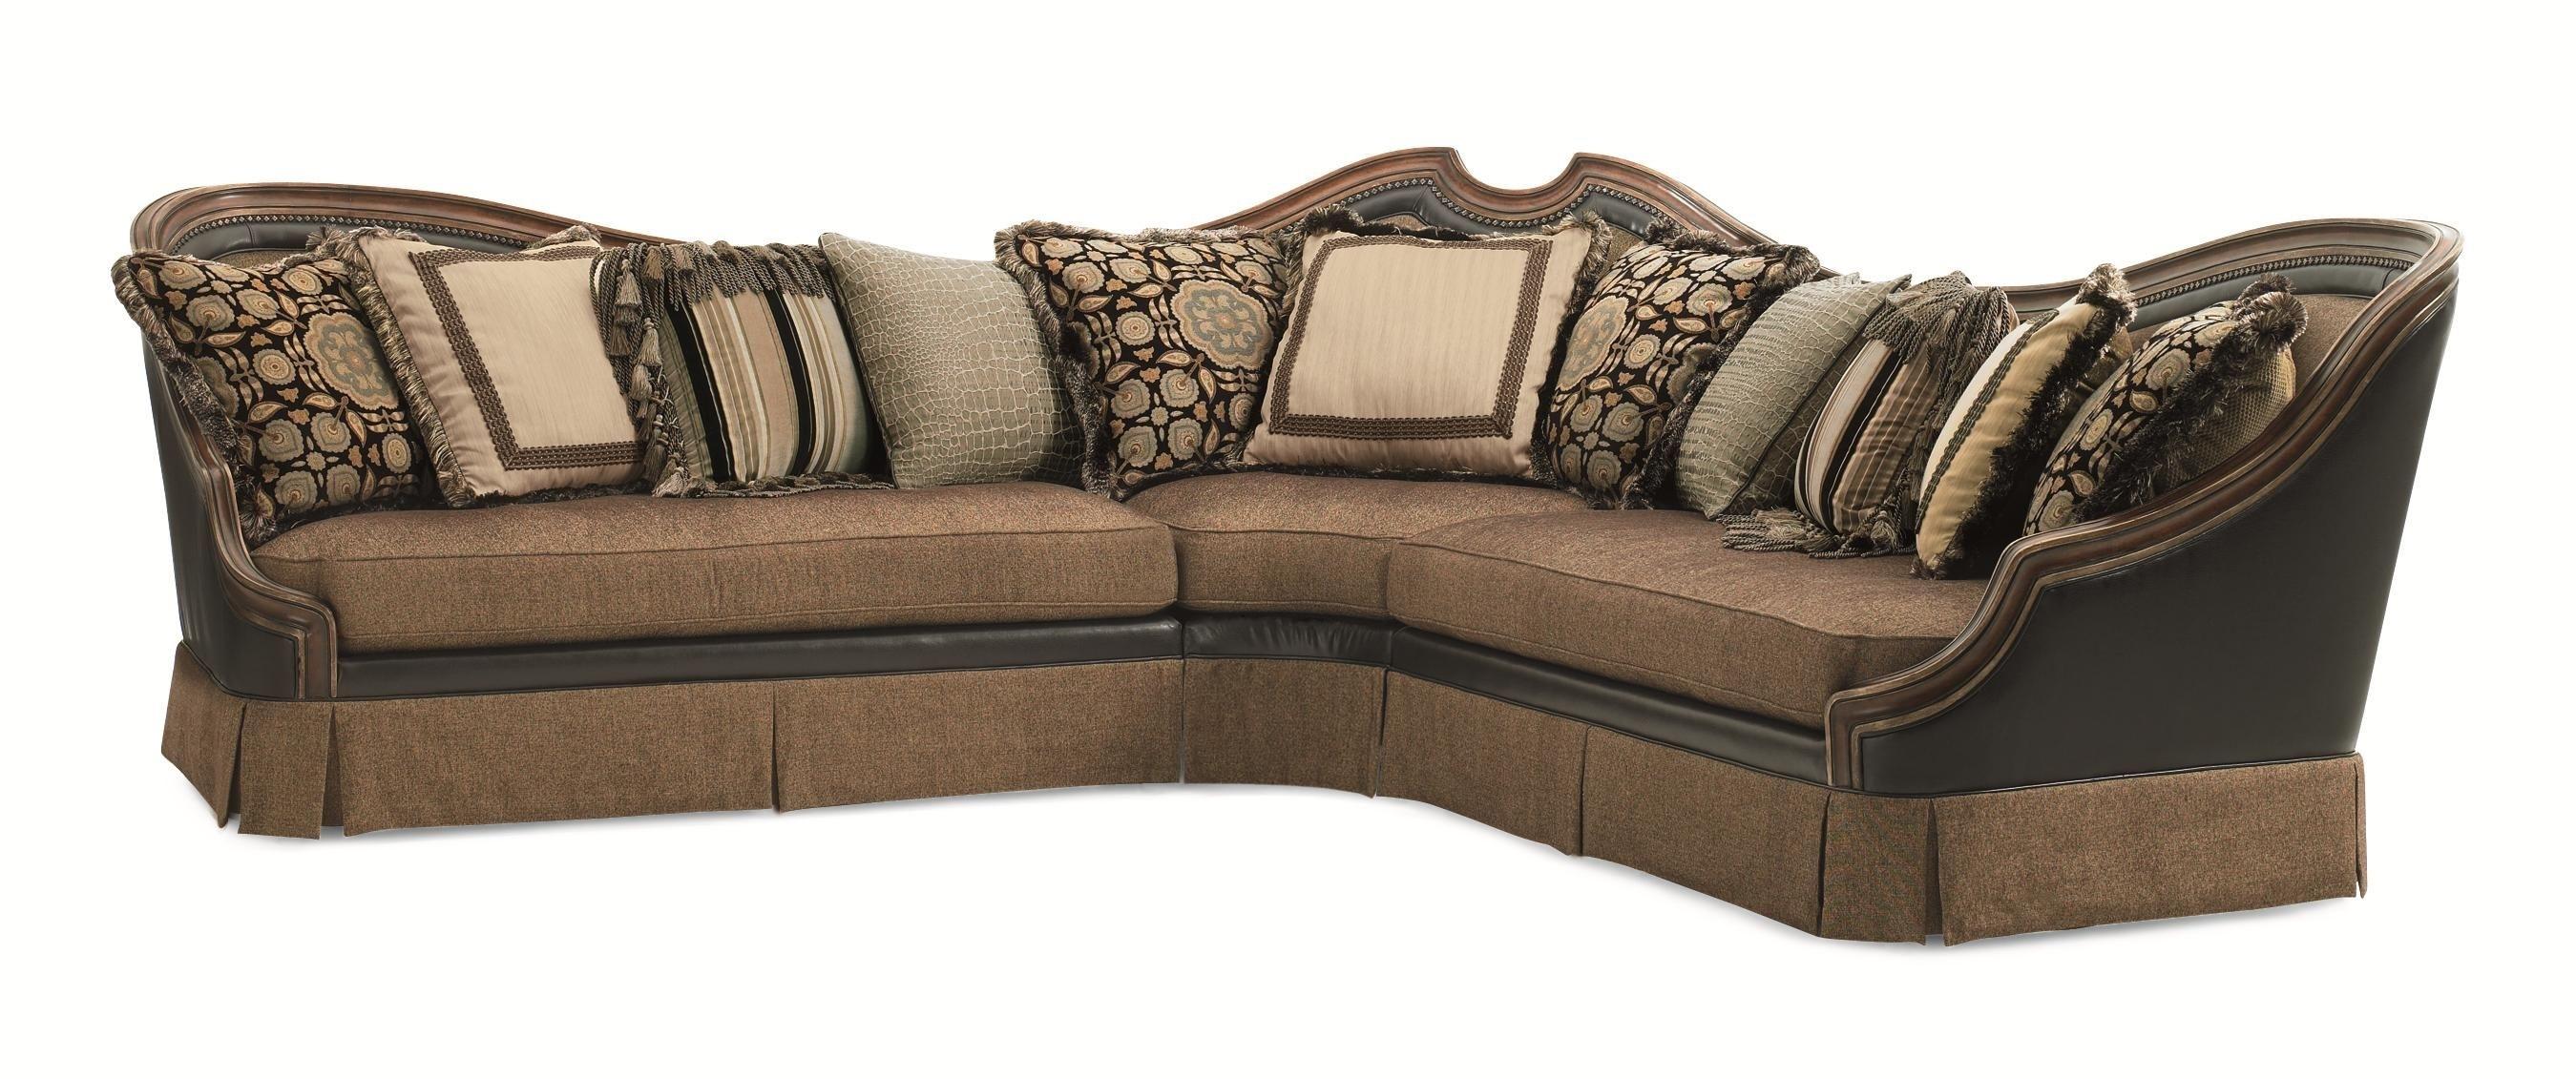 Wyeth Sofa Sectional Groupschnadig | Home Decor | Pinterest Regarding Nebraska Furniture Mart Sectional Sofas (View 2 of 10)